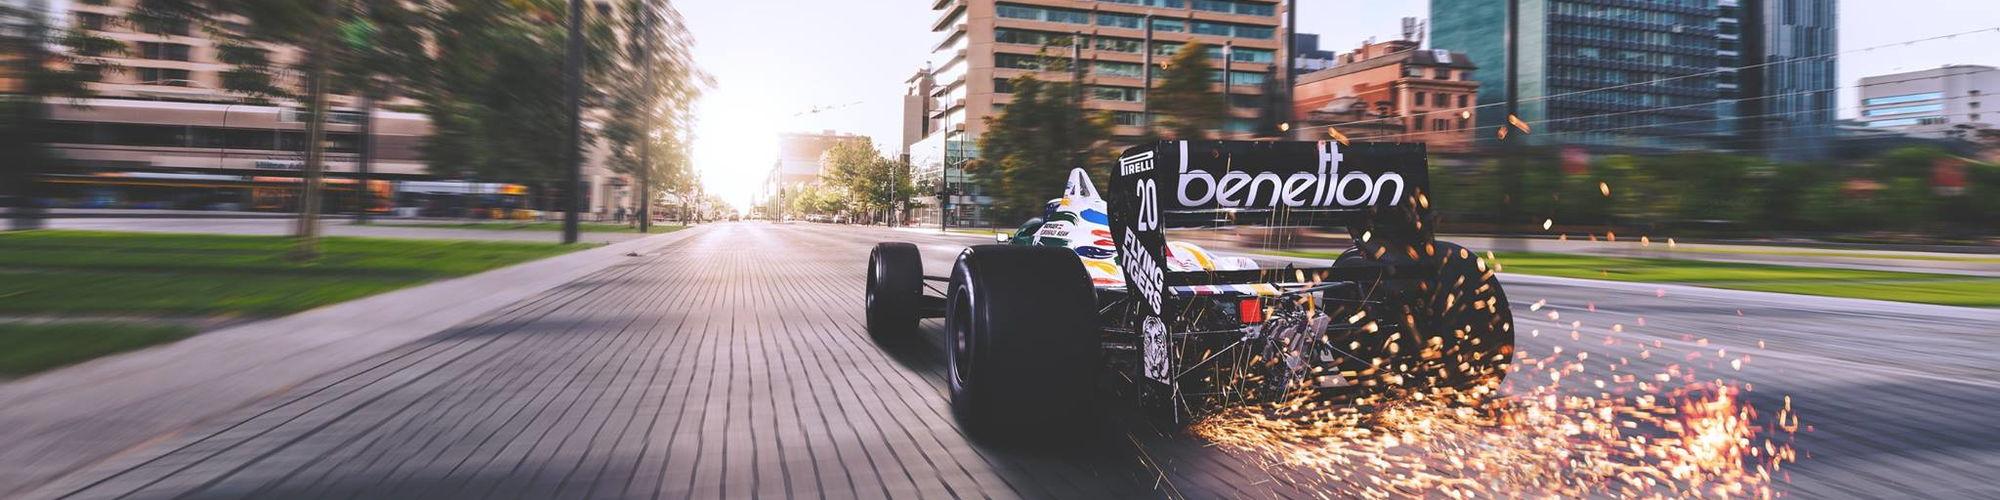 Sporting Car Club of South Australia cover image